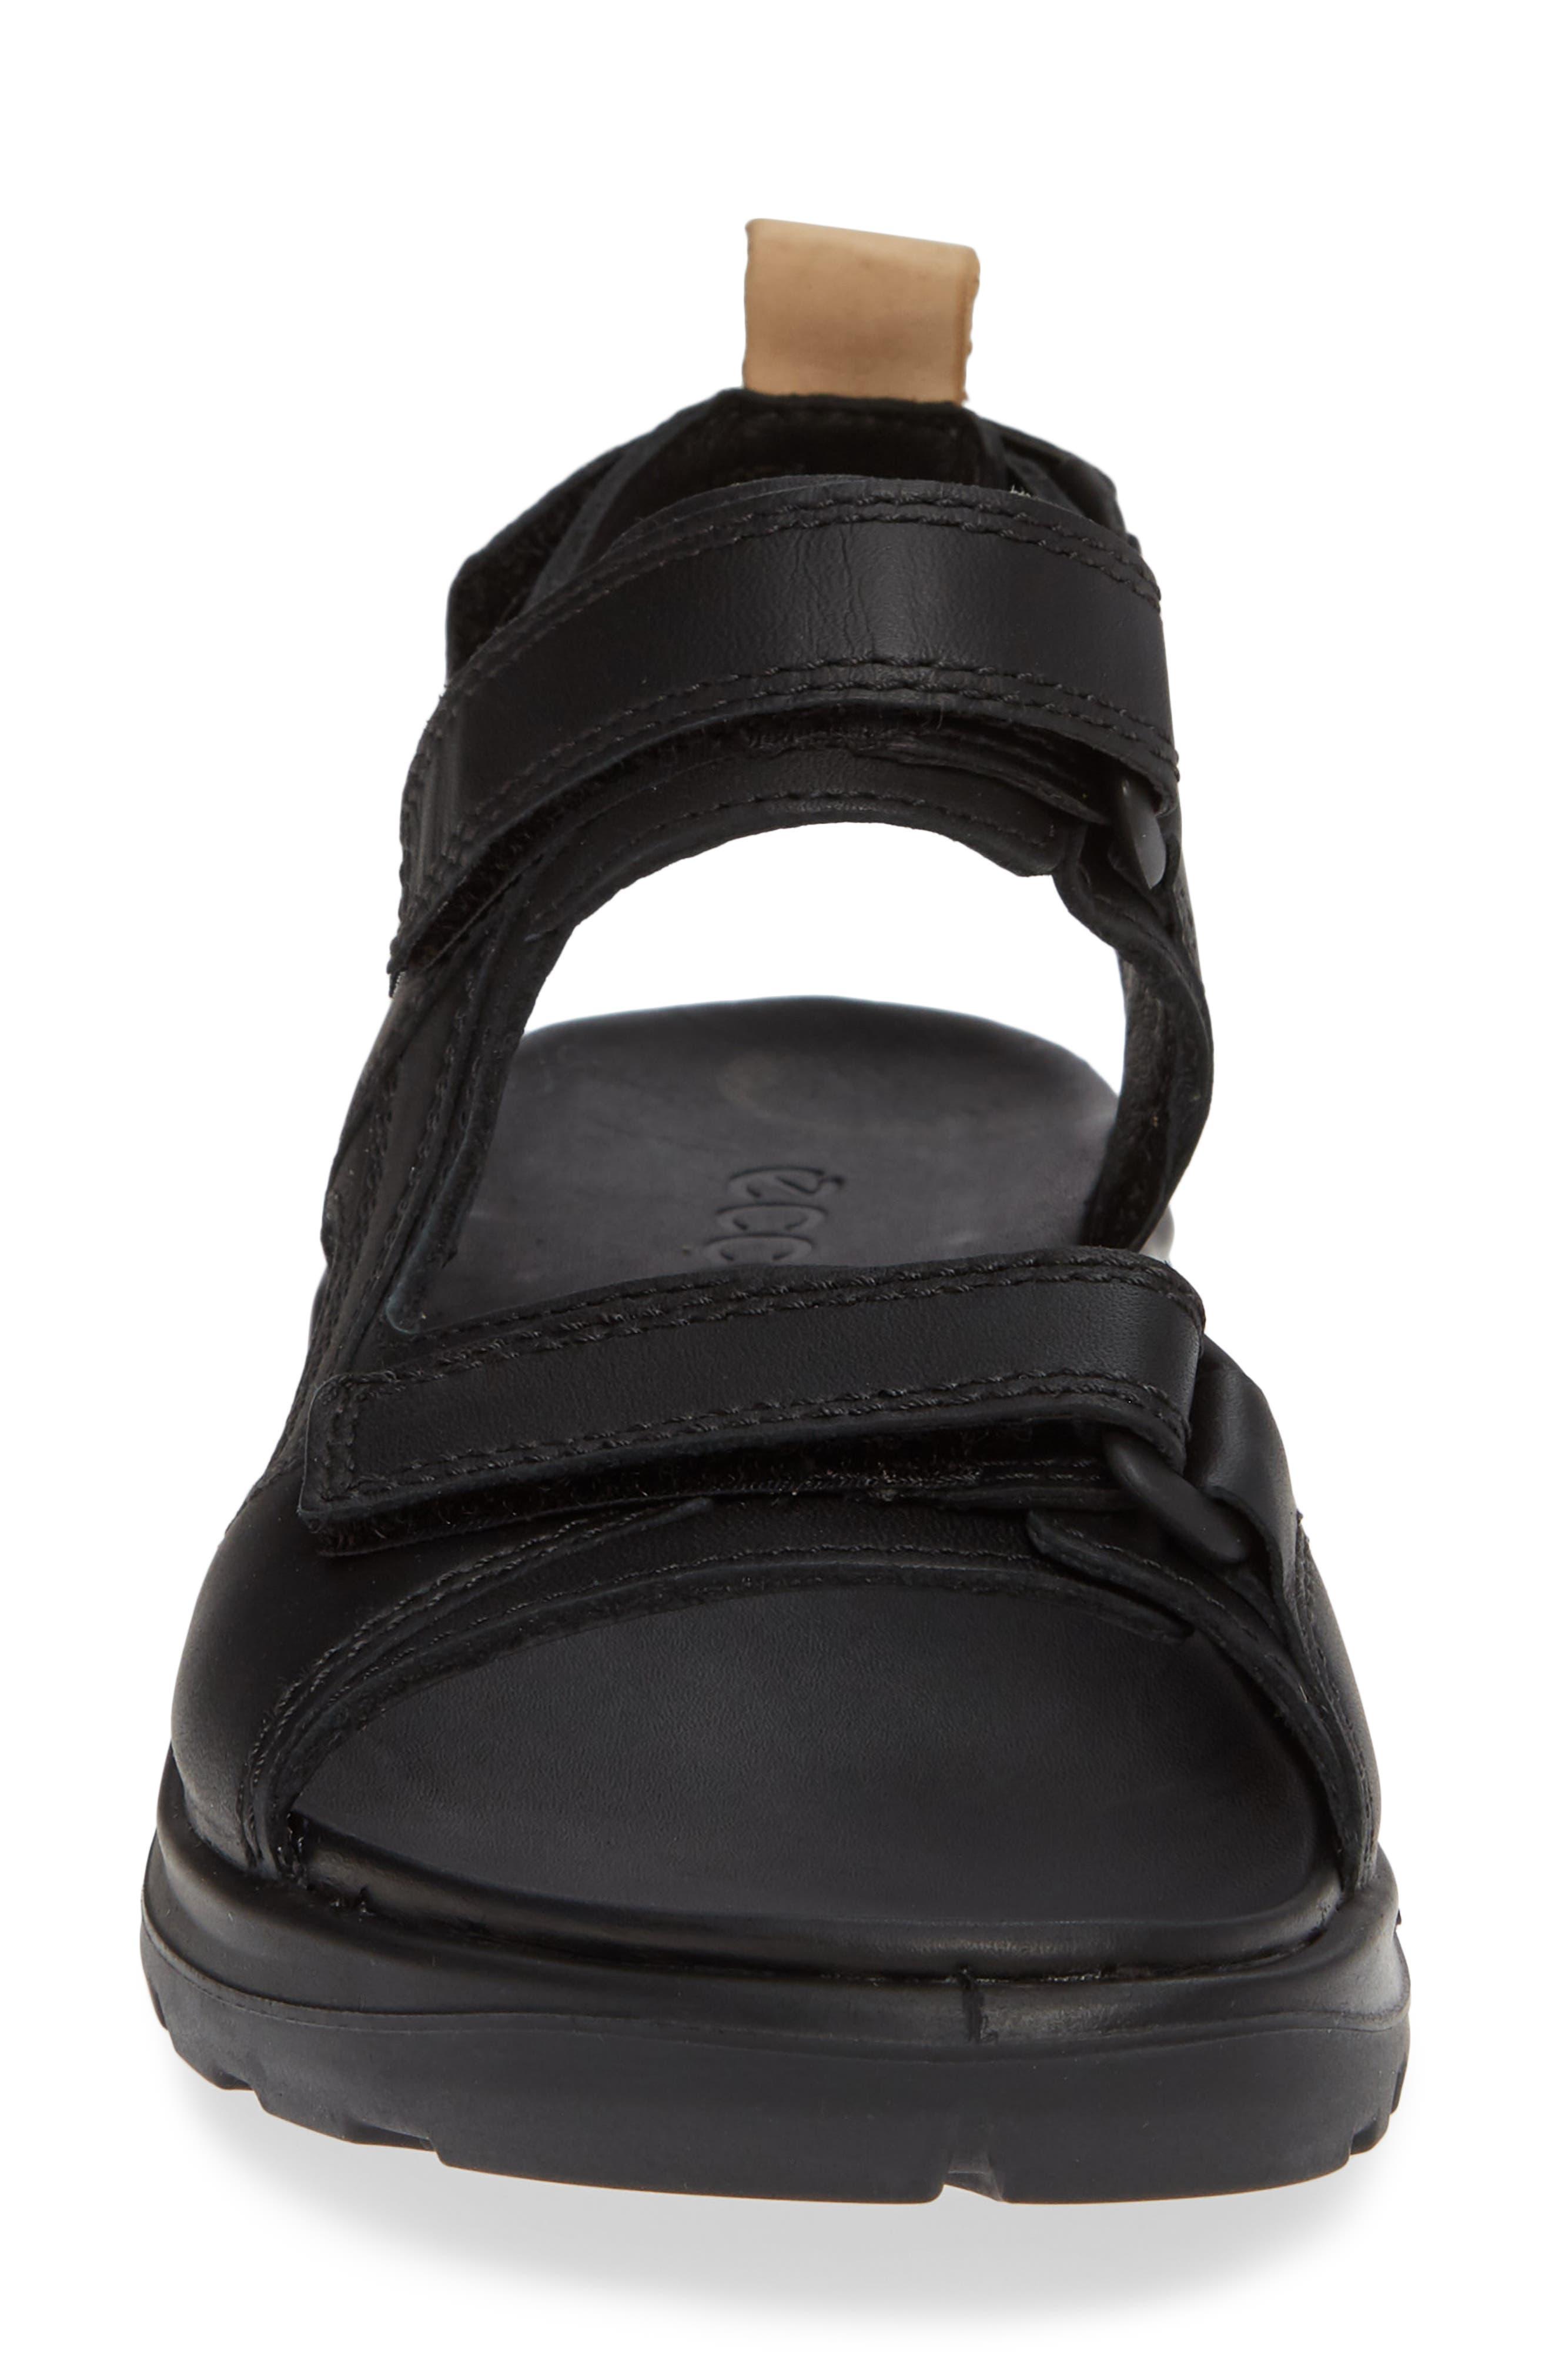 Premium Offroad Sandal,                             Alternate thumbnail 4, color,                             BLACK NUBUCK LEATHER